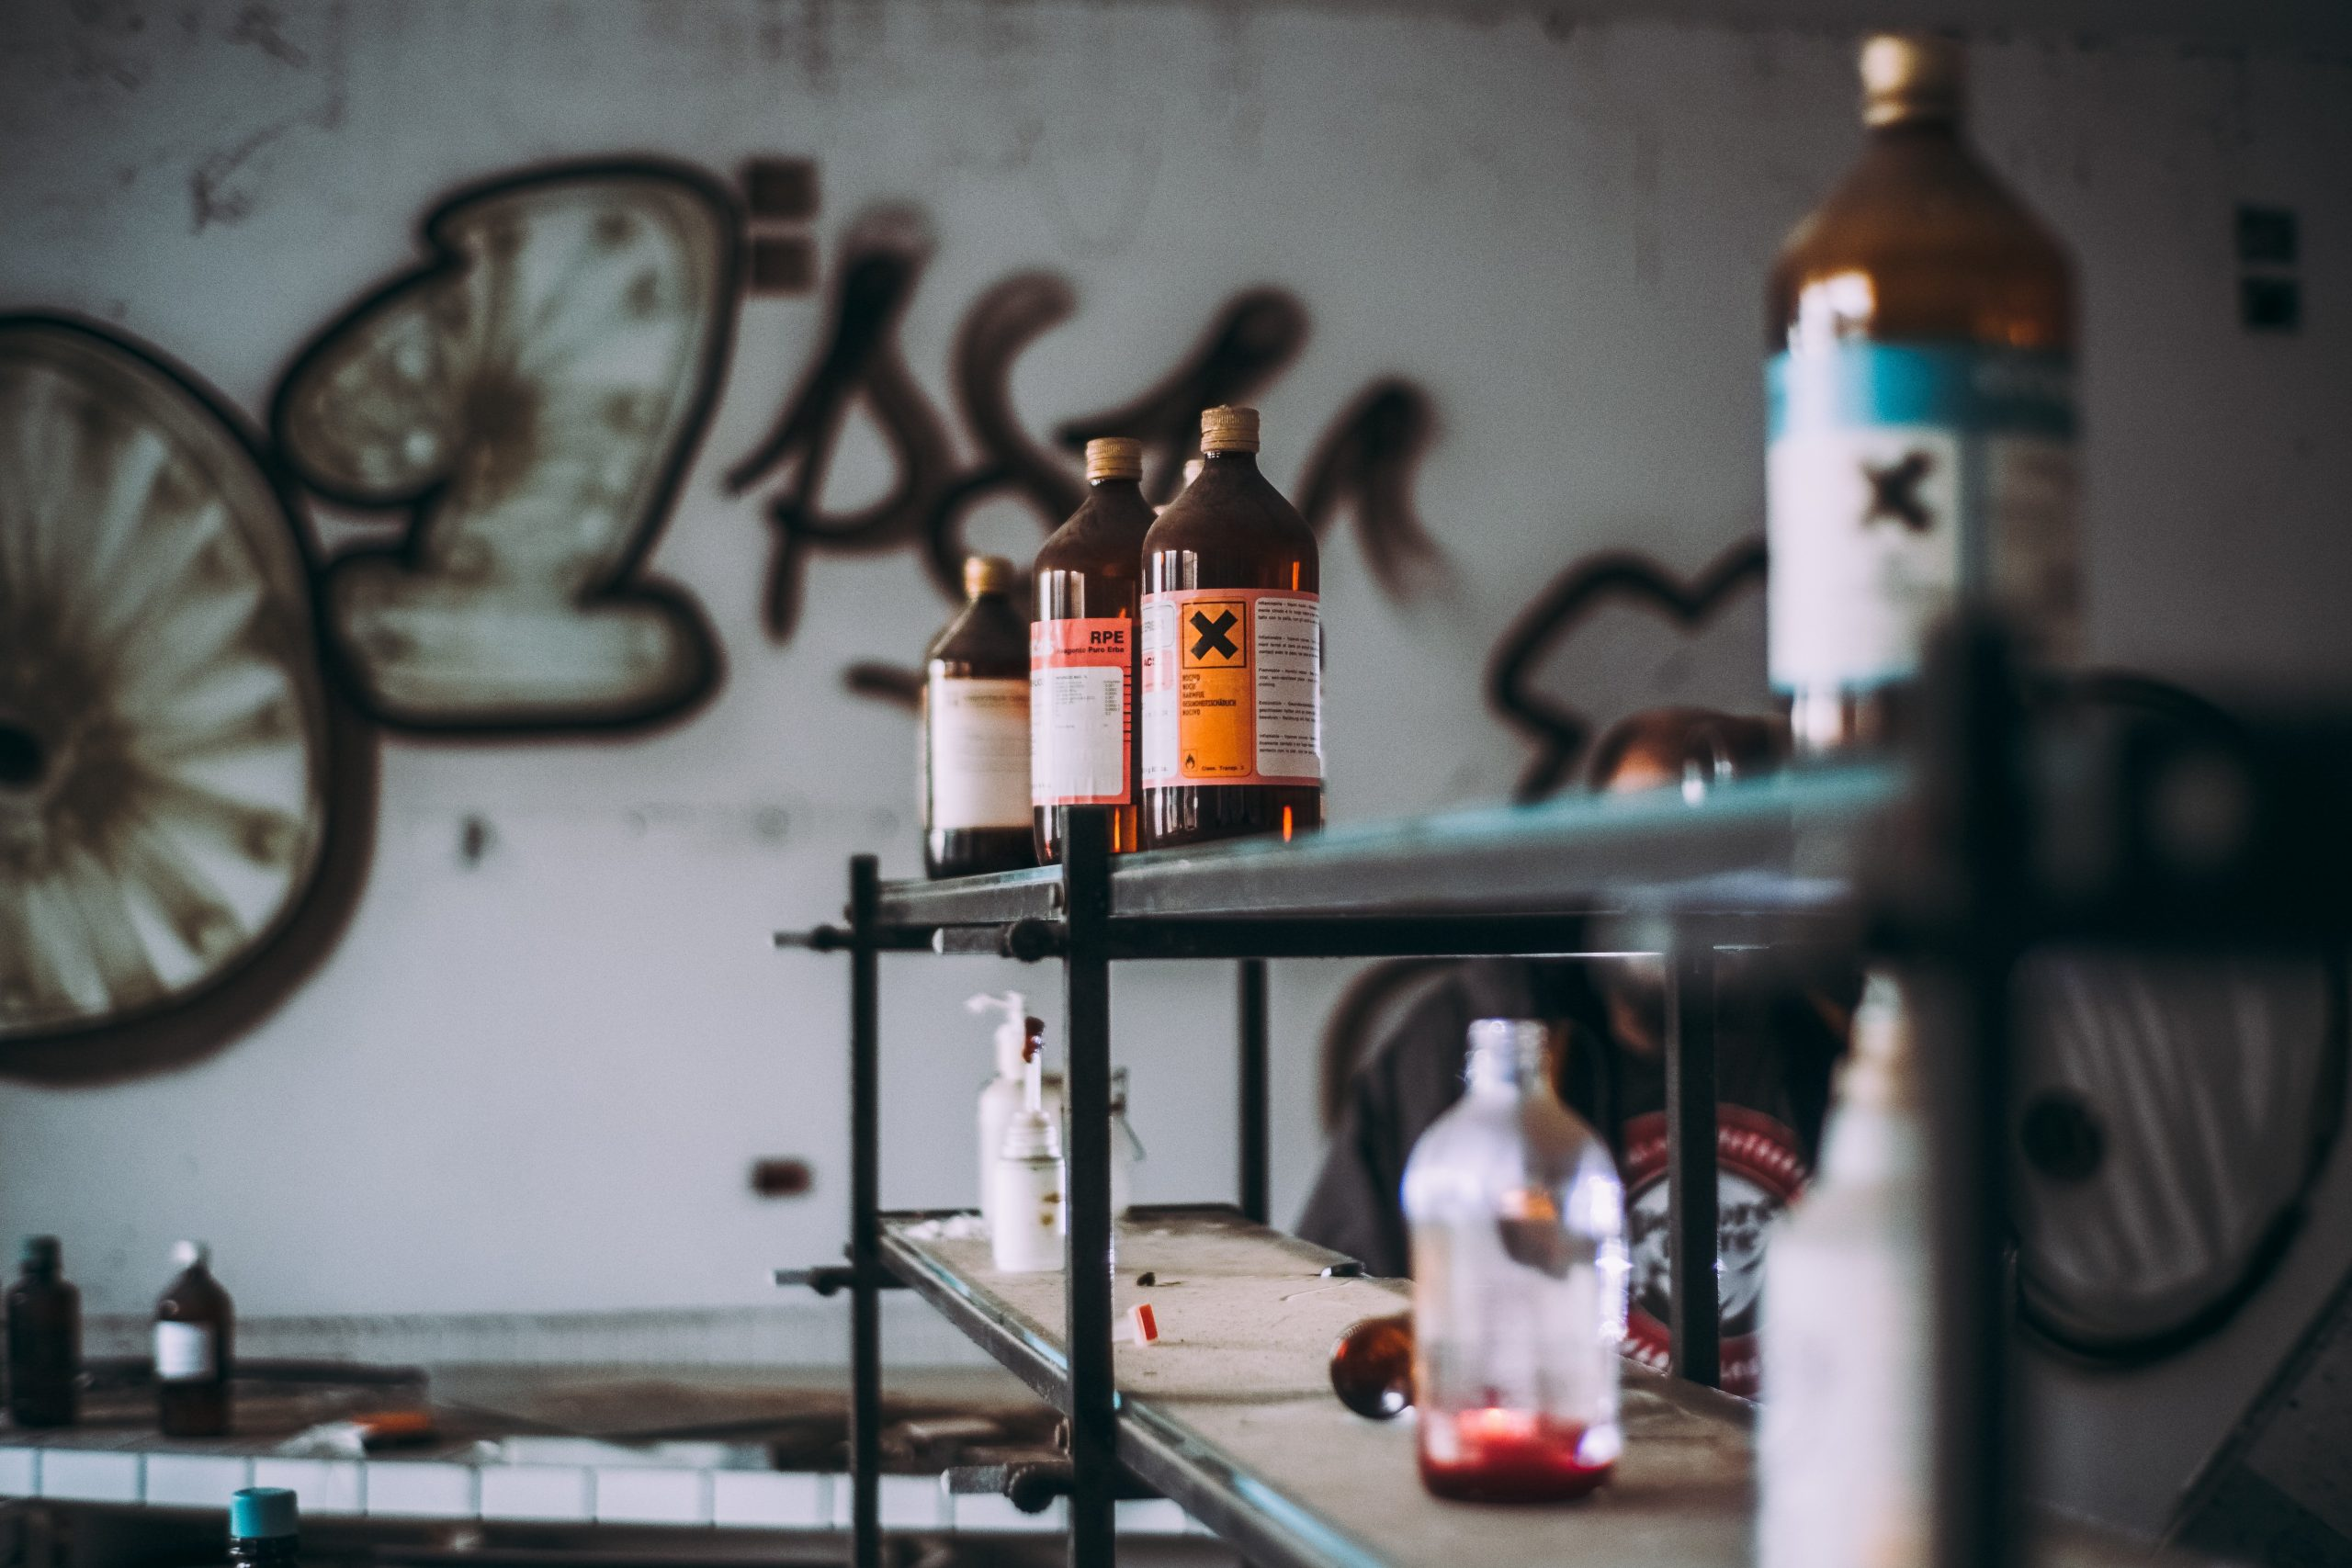 abandoned-blur-bottles-1771809